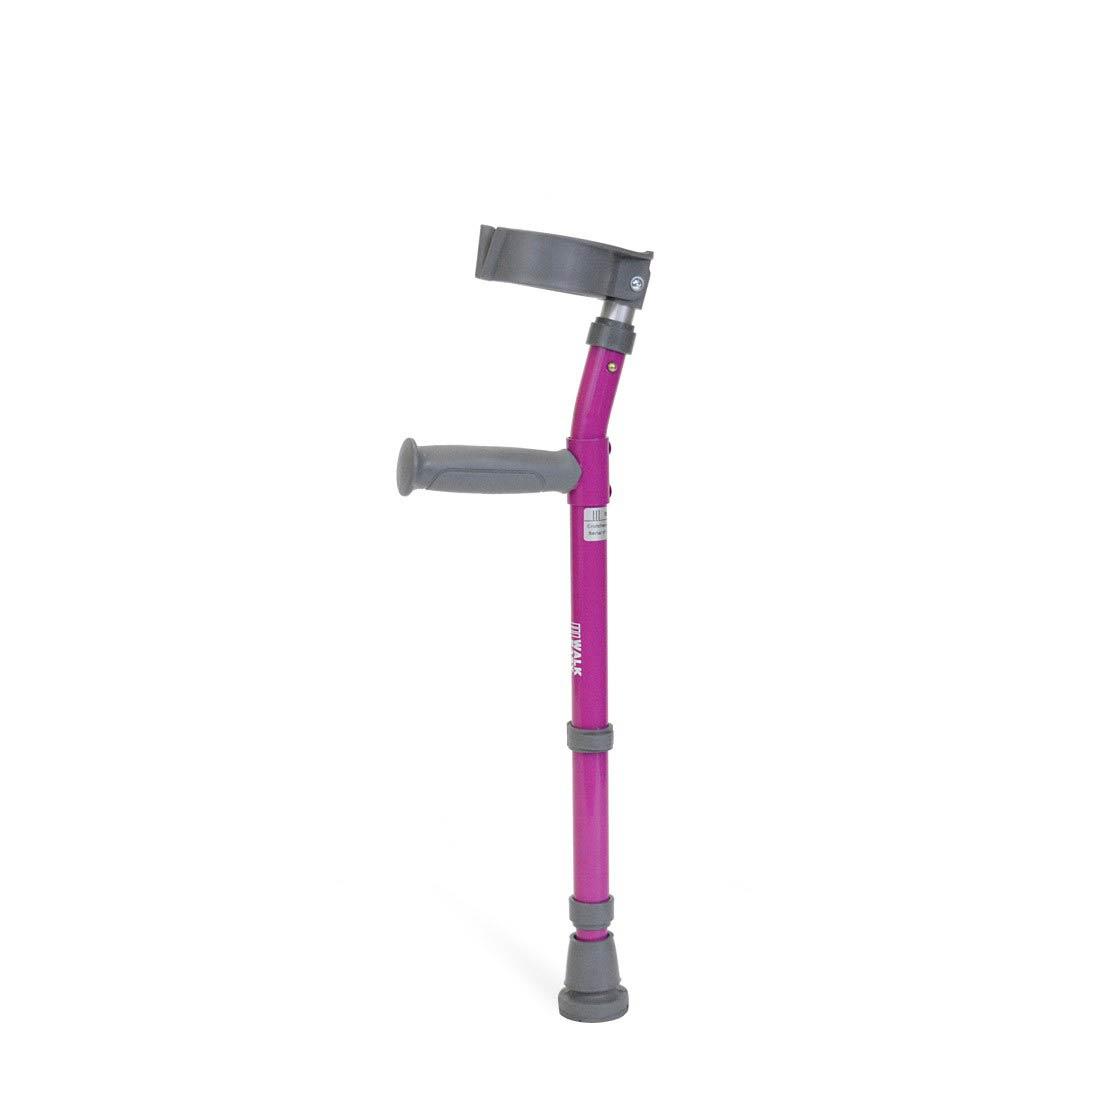 Walk Easy Toddler Forearm Height Adjustable Crutches - Walk Easy